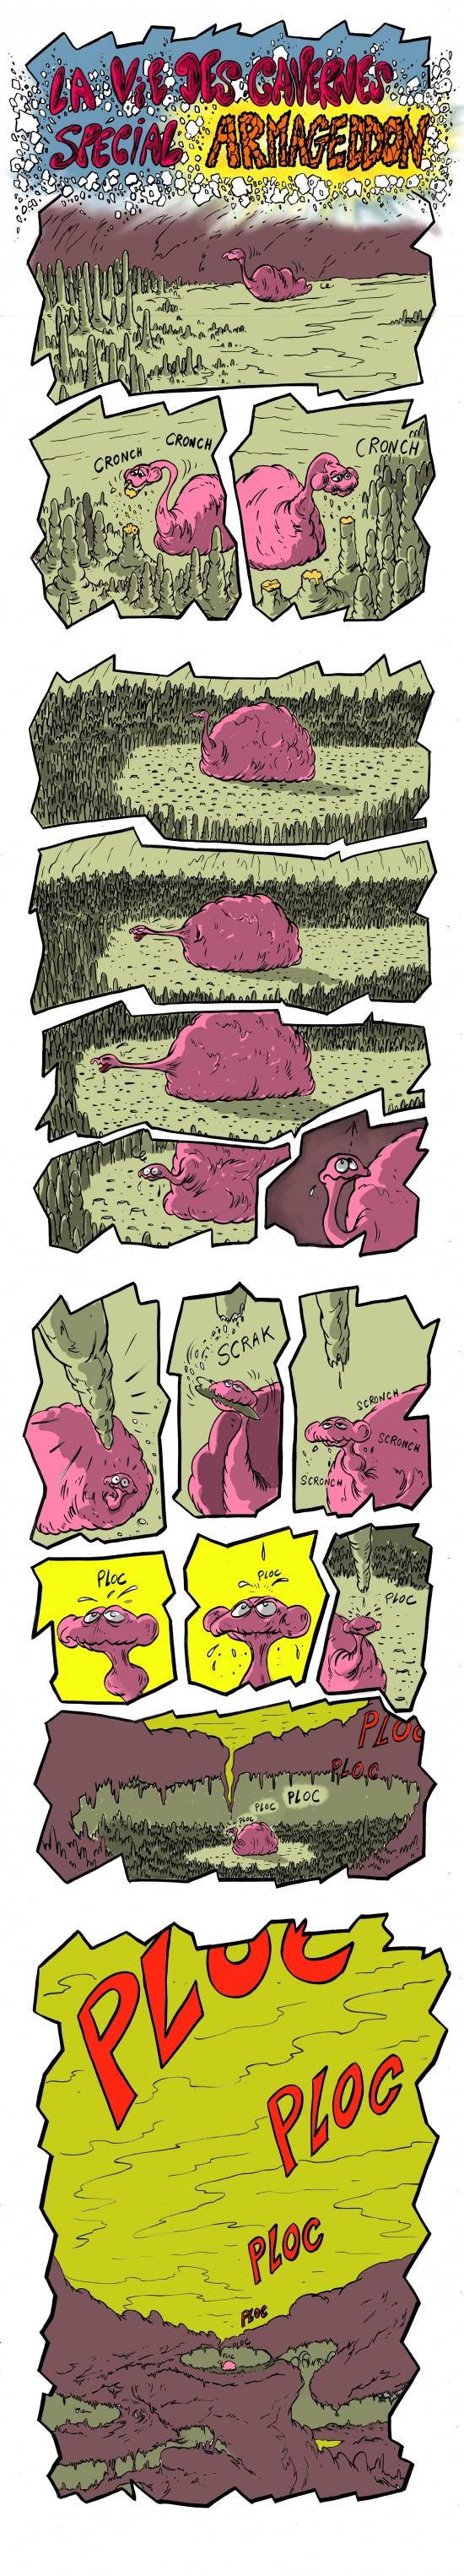 fanzine,bd,bande-dessinée,armagedon,armageddon,strip,gratuite,caverne,david roche